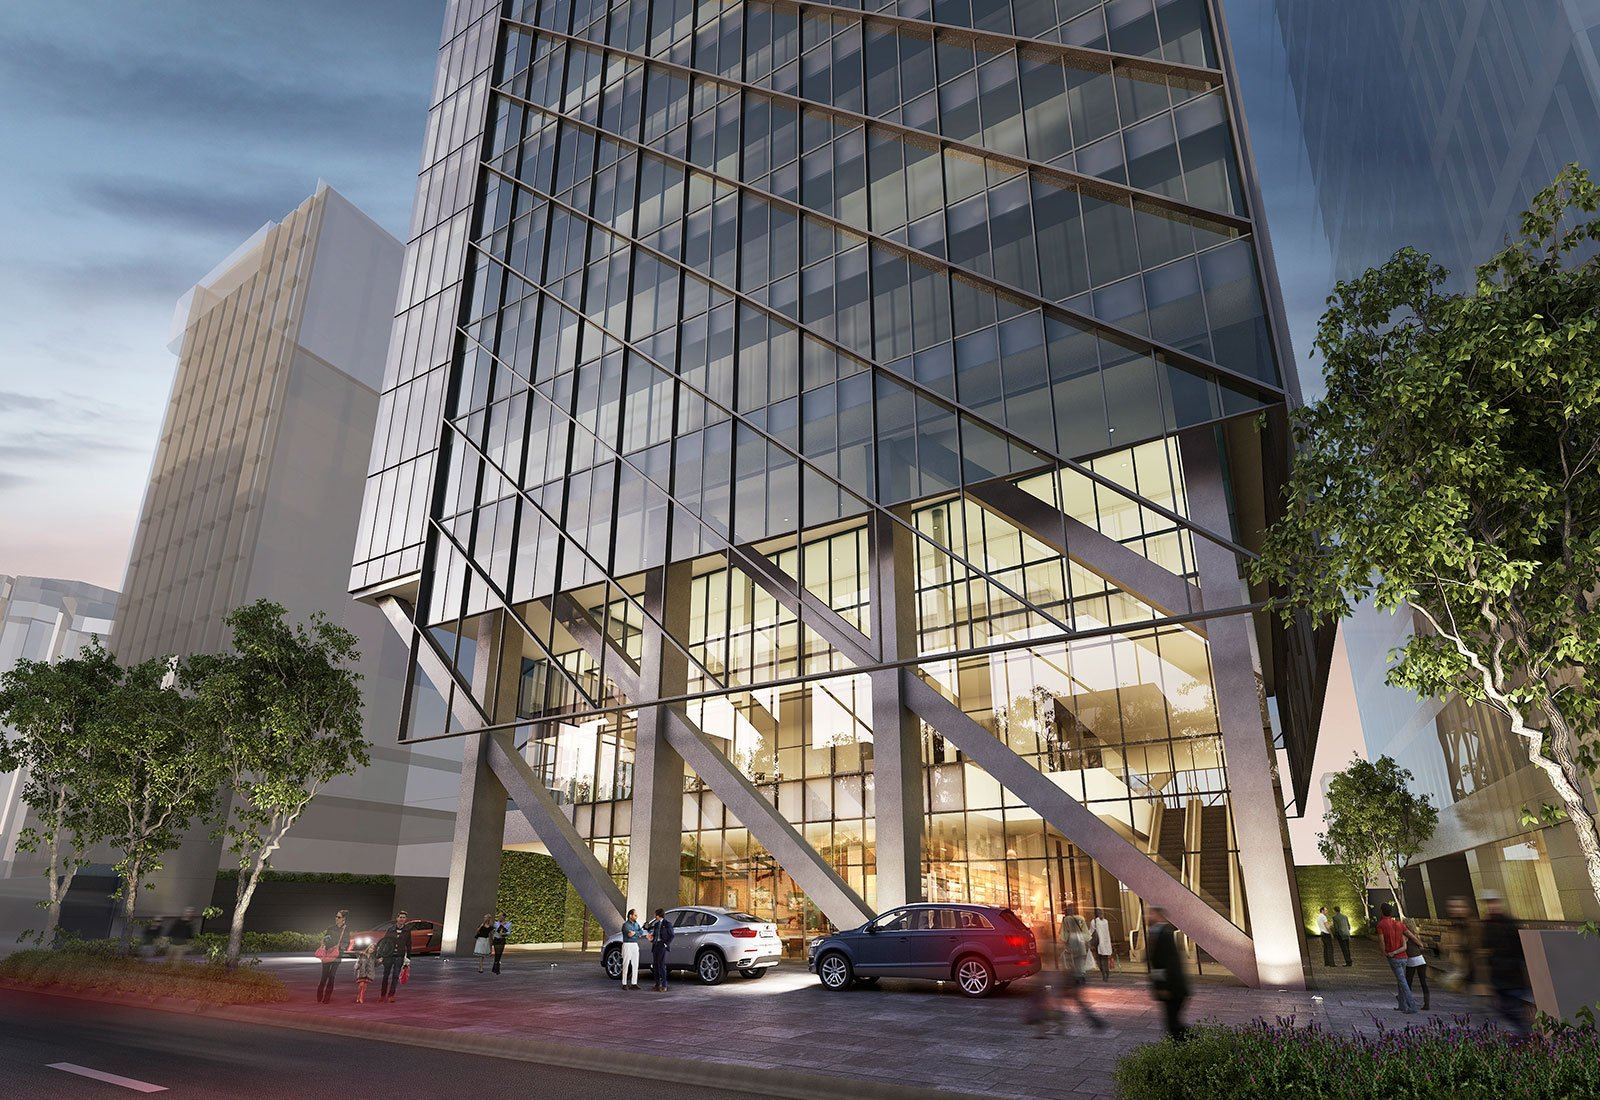 Studio Home Desing Guadalajara Vertex Studio On Twitter Quot Is Tower For Edmonds